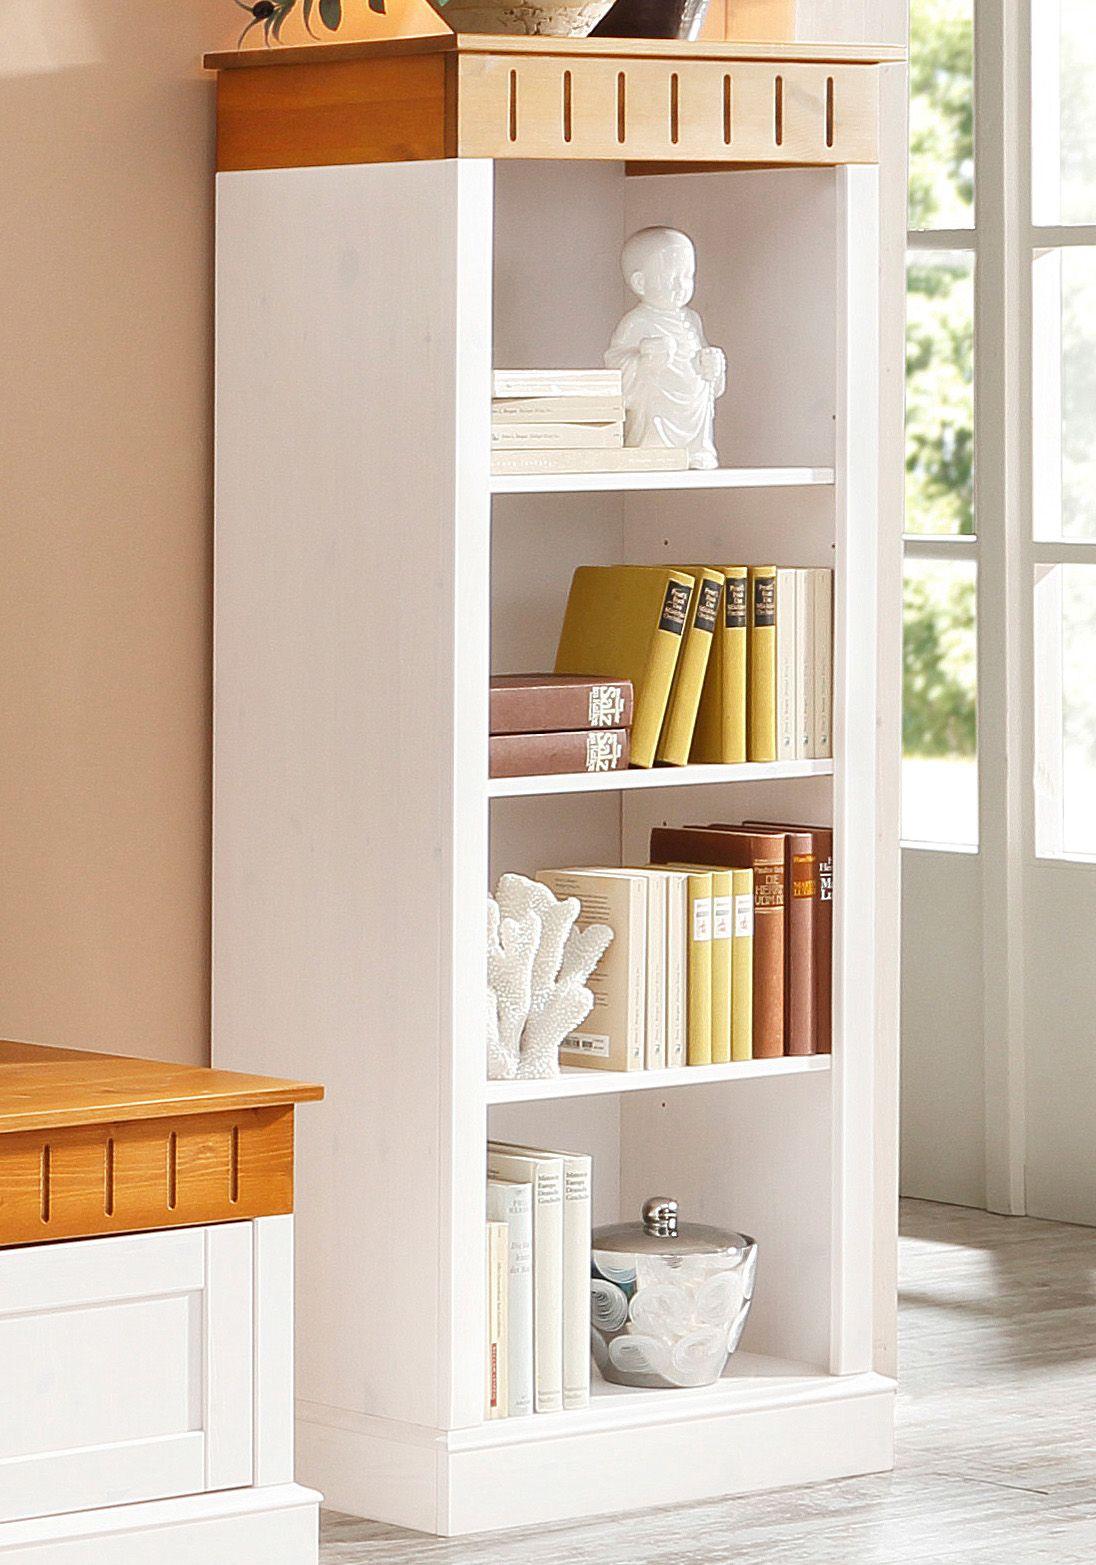 massivholz regal home affaire soeren h he 156 cm breite 80 cm pictures to pin on pinterest. Black Bedroom Furniture Sets. Home Design Ideas